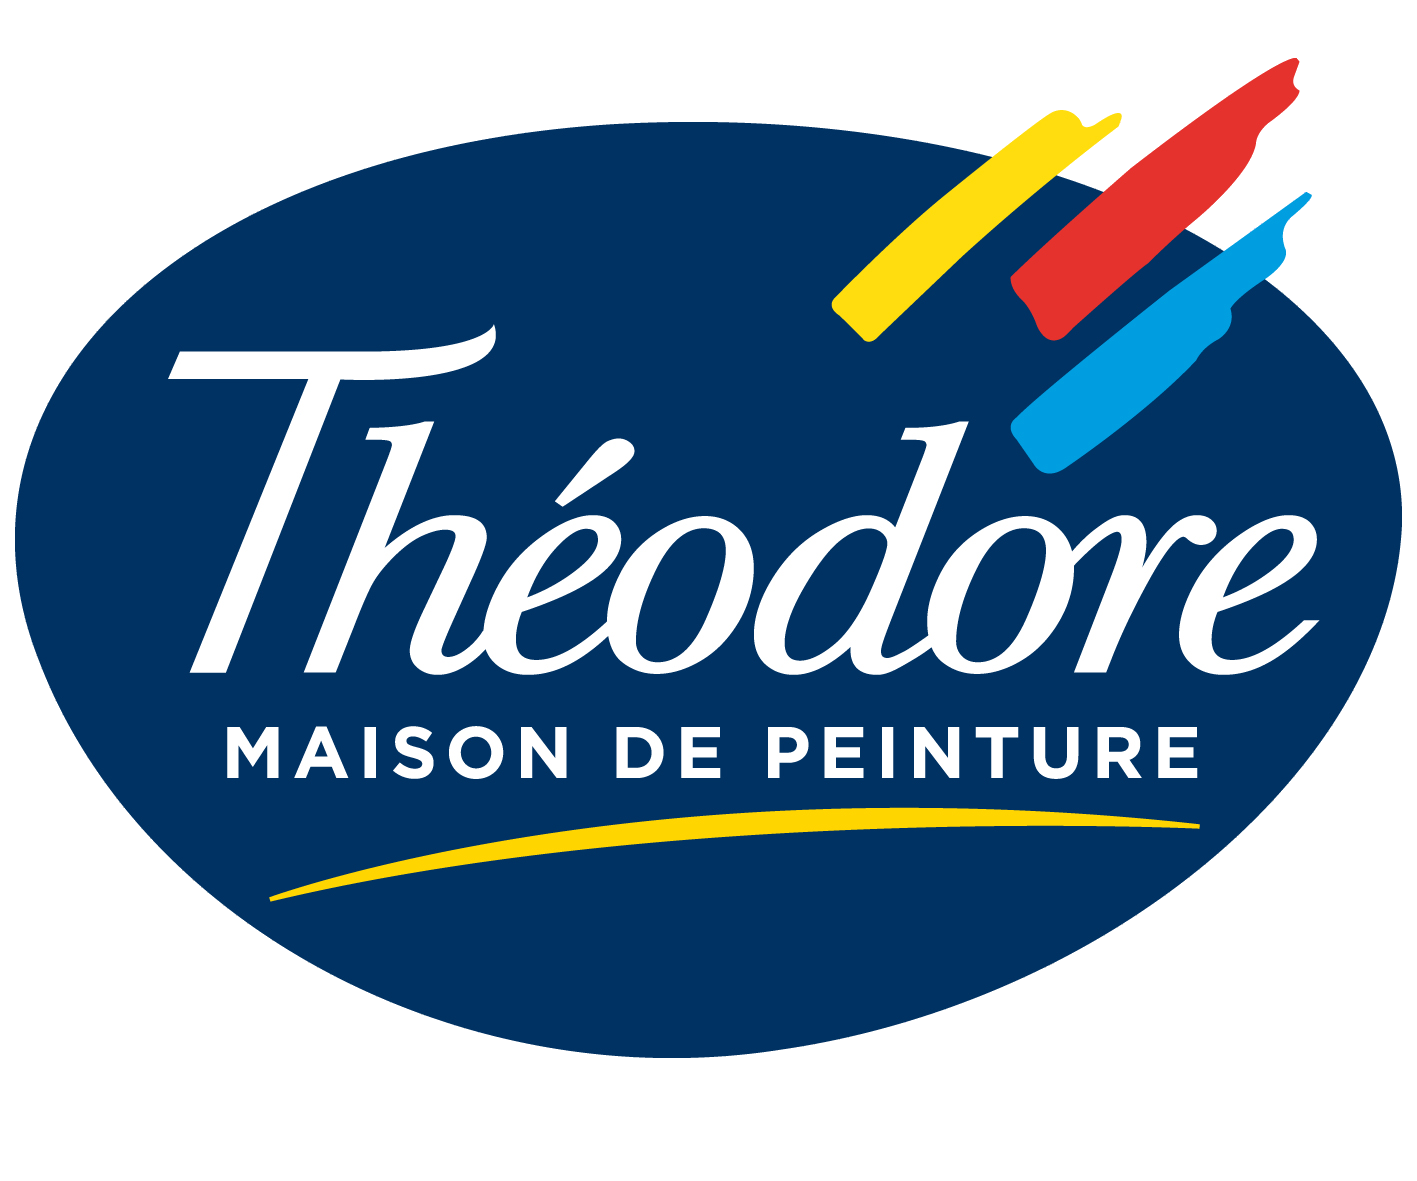 LOGO_THEODORE_Maison_de_peinture